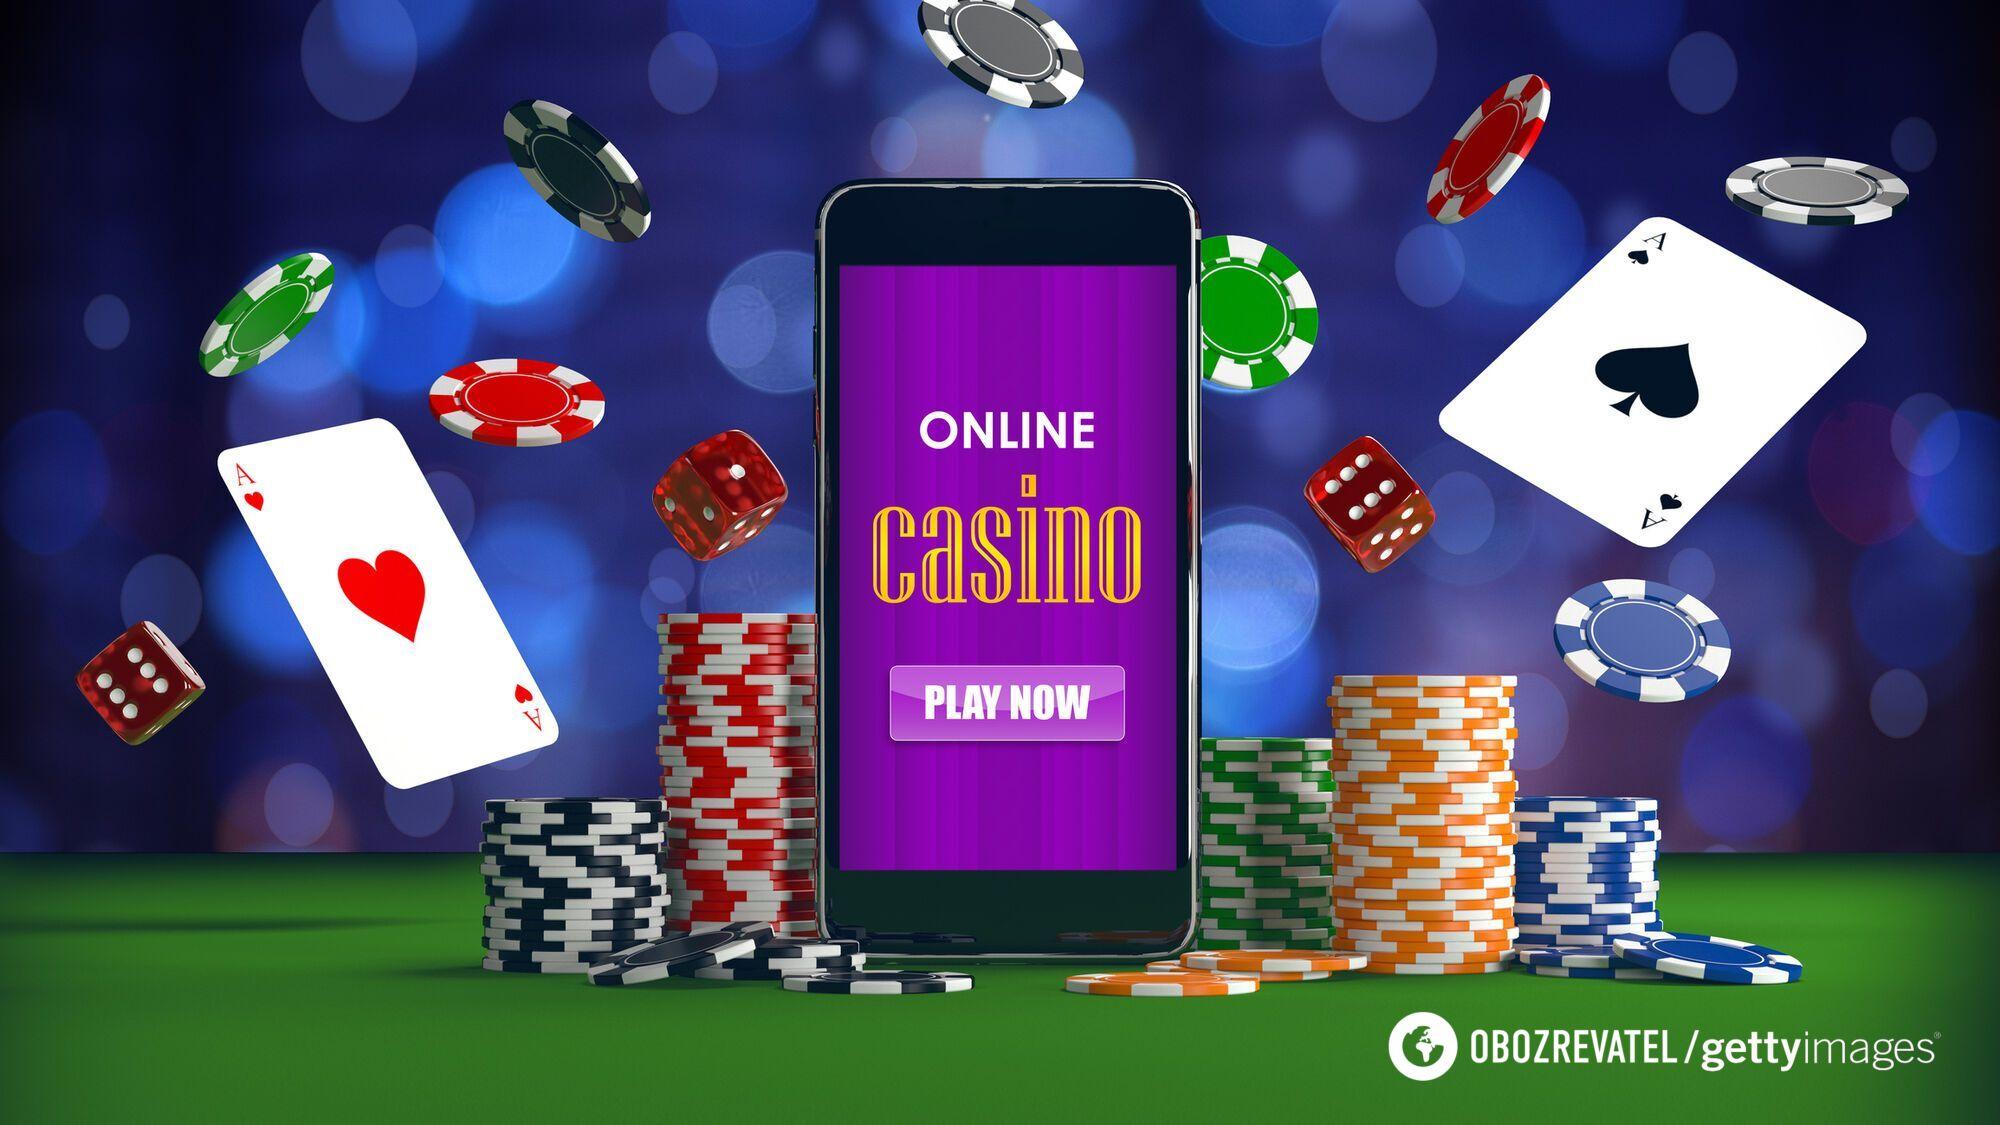 Онлайн-казино, Филиппины.